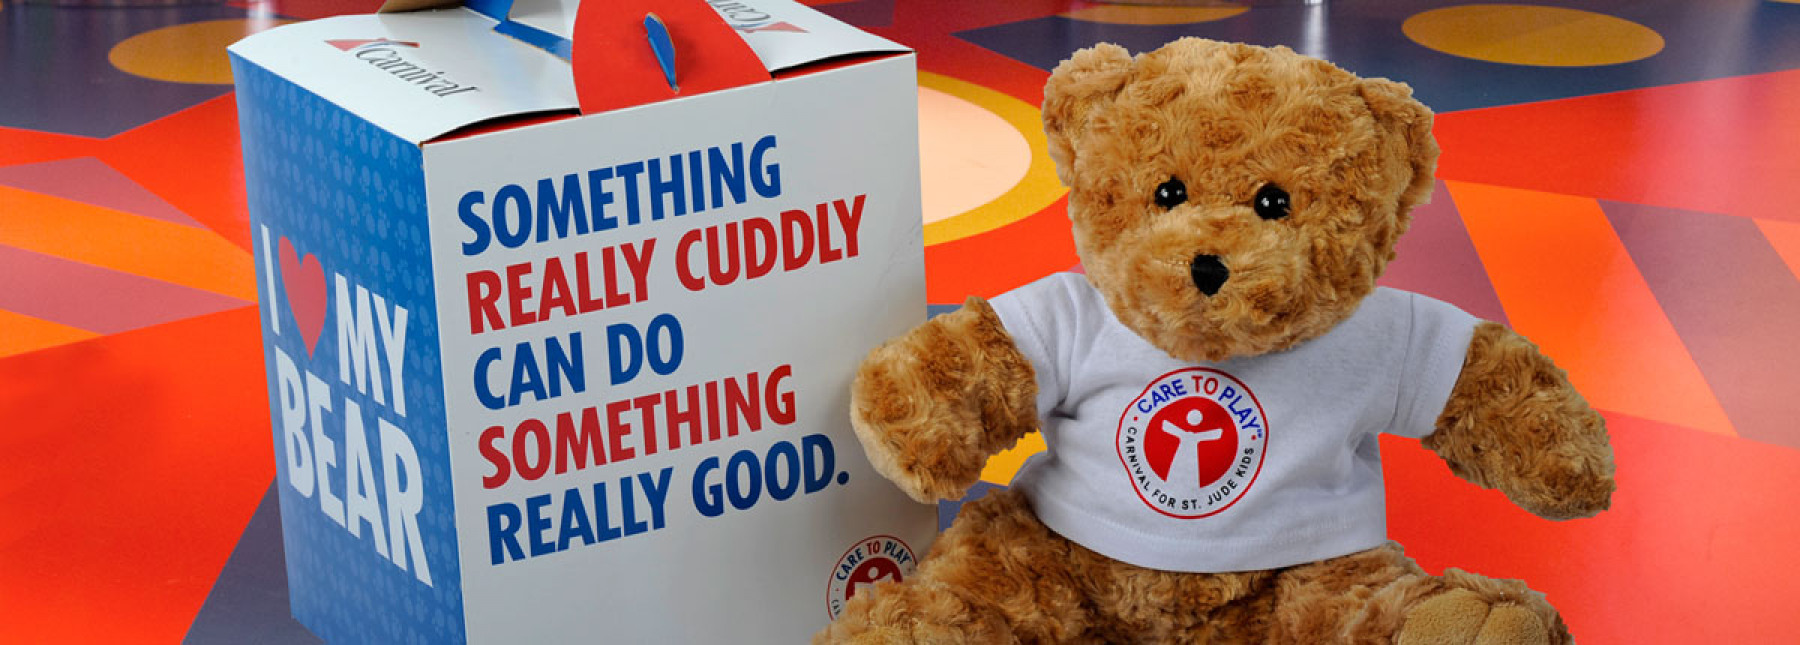 Carnival Valor beary-cuddly-1.jpg